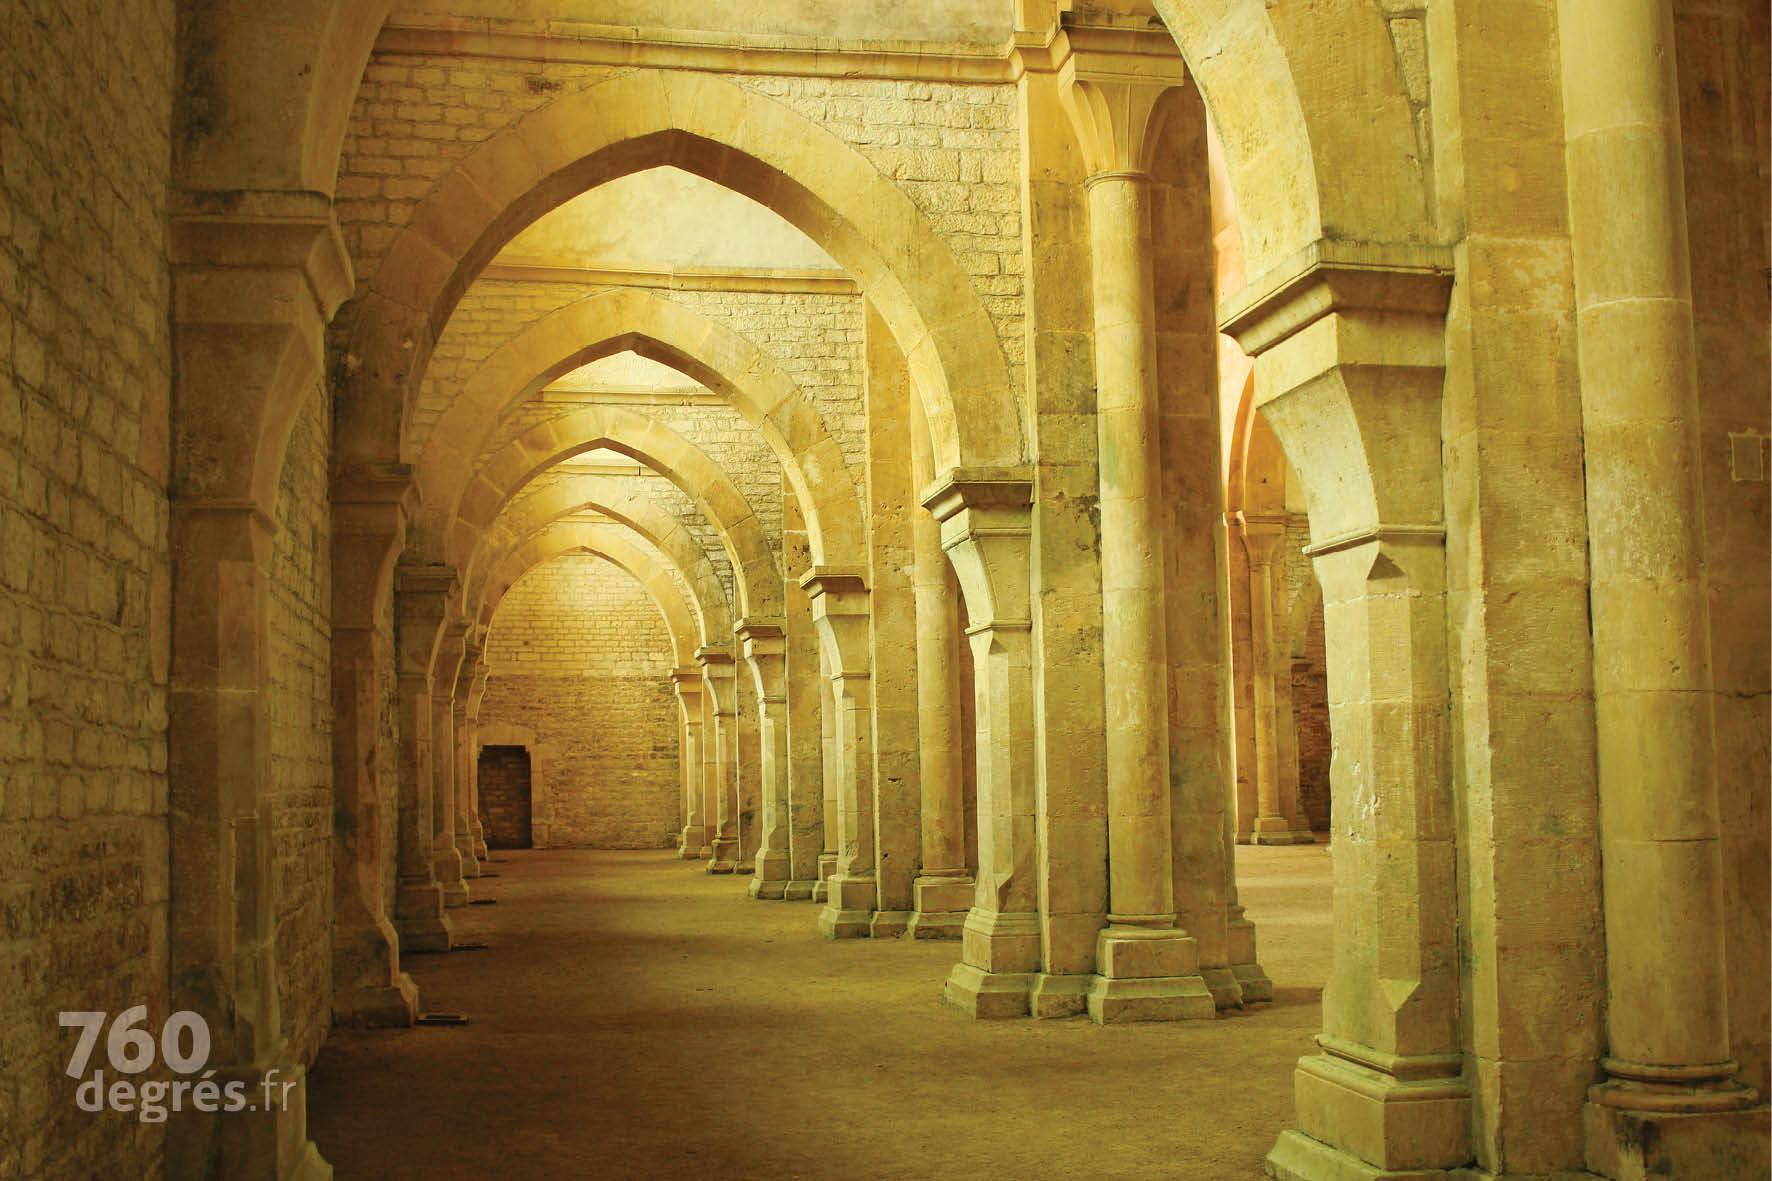 760degres-abbaye-fontenay-05